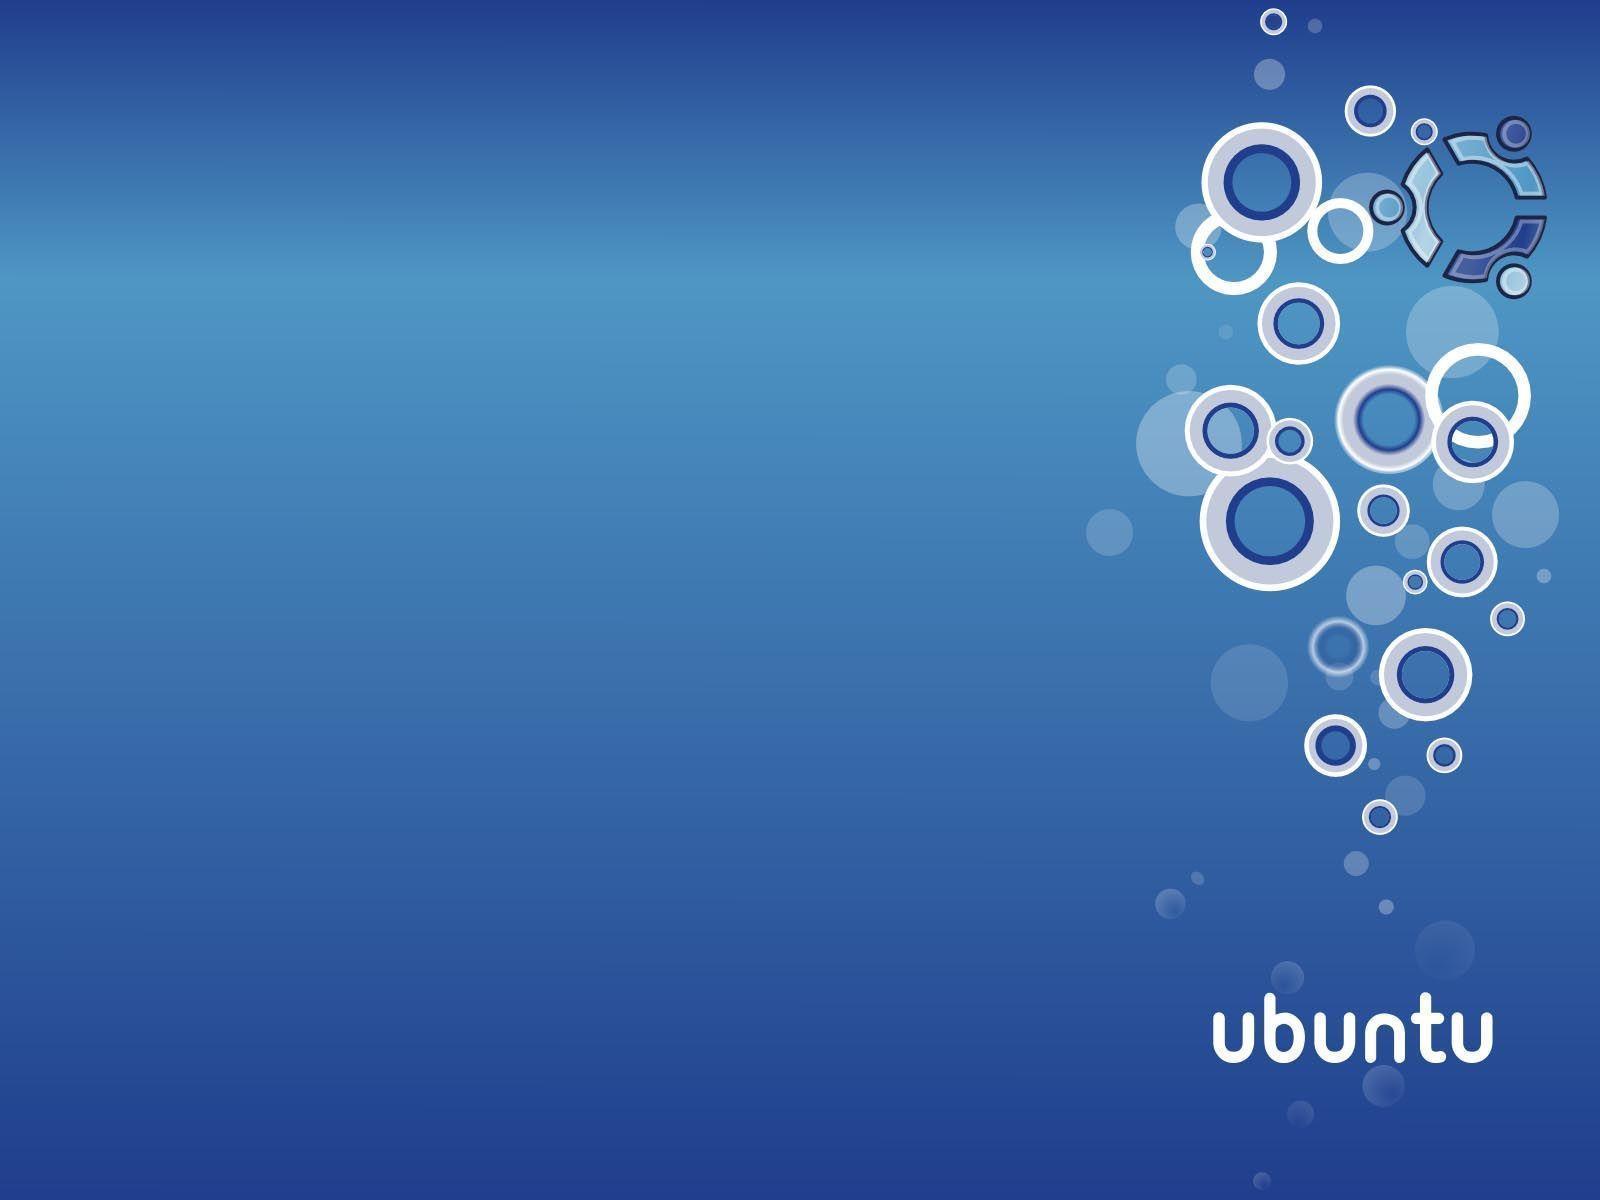 Ubuntu Wallpapers Blue wwwgalleryhipcom   The Hippest Pics 1600x1200